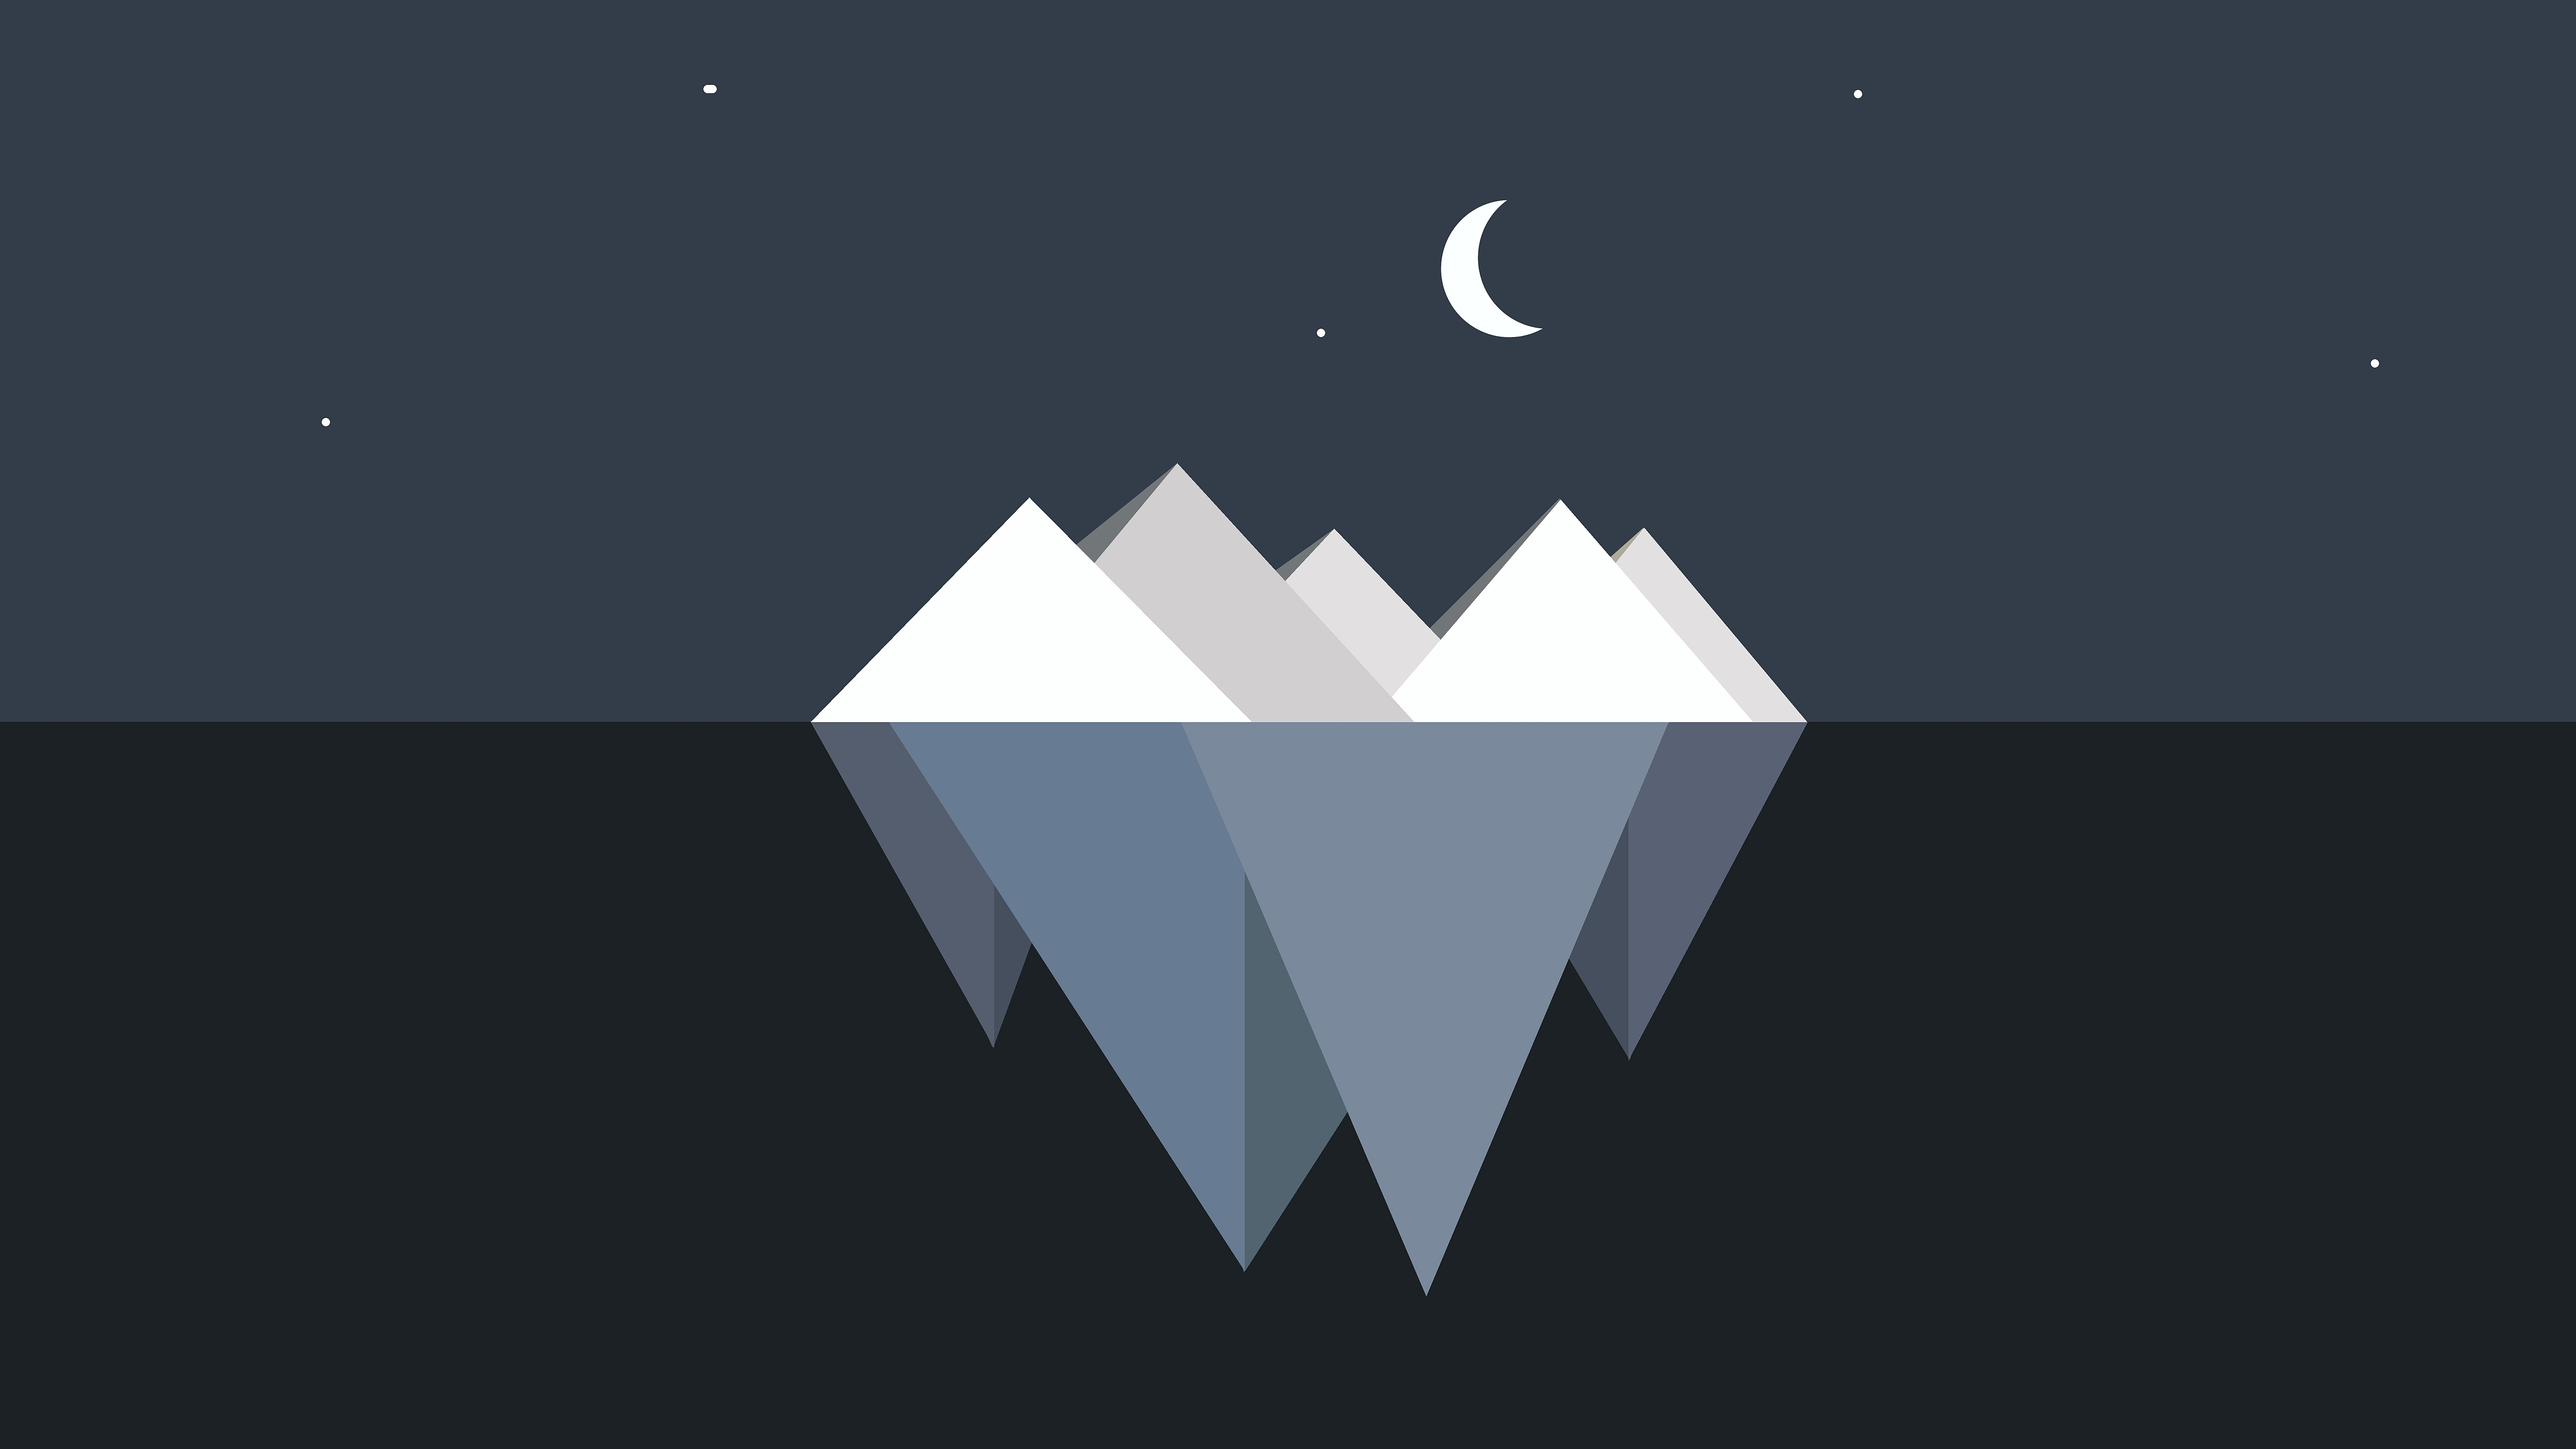 Minimal iceberg wallpaper